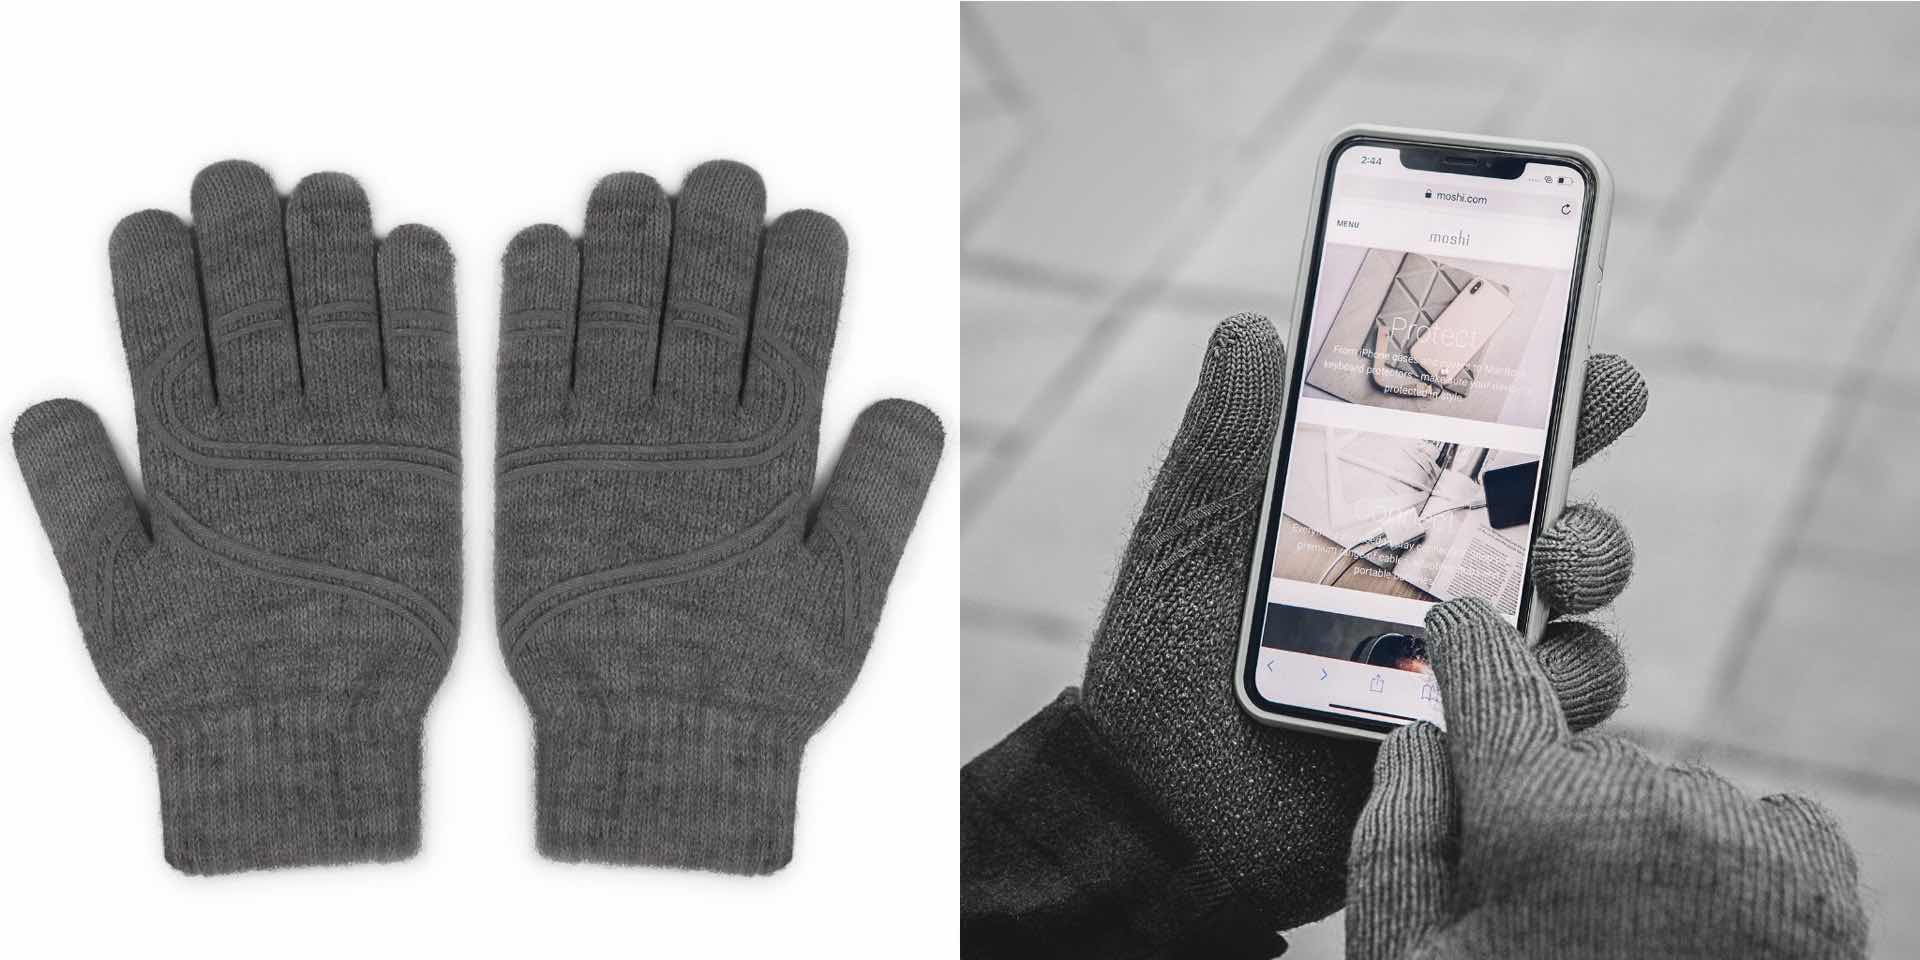 moshi-digits-touchscreen-gloves